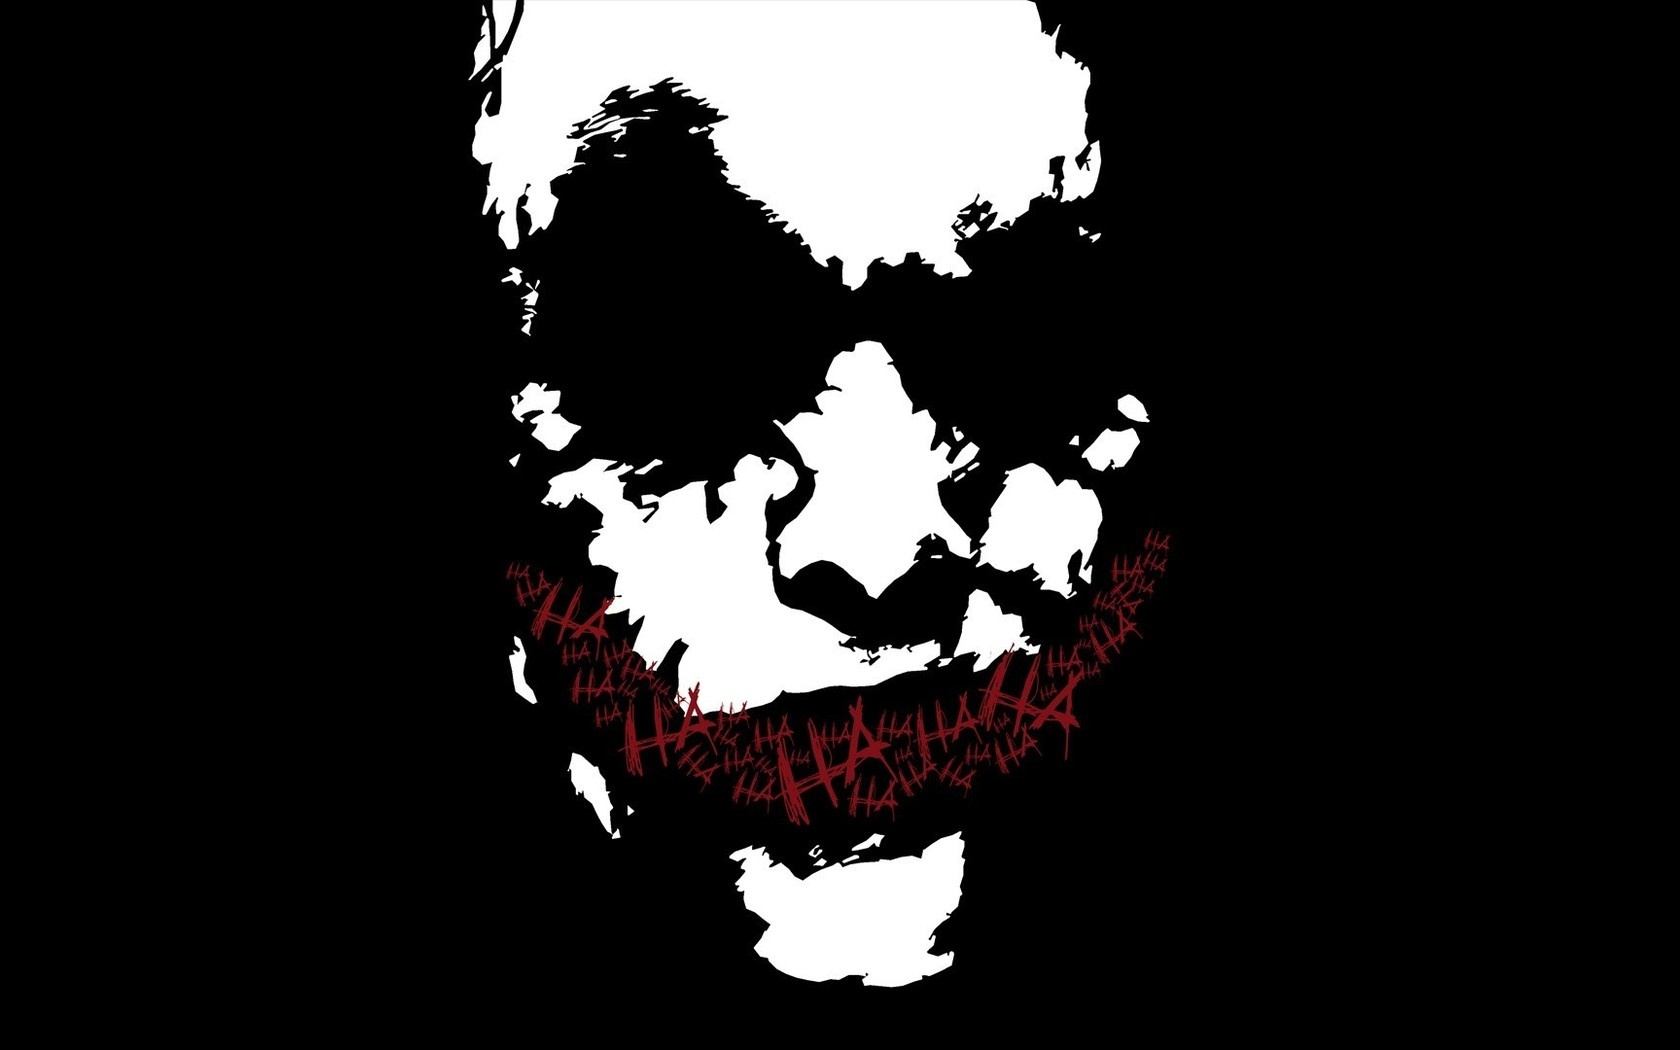 Joker Drawing Emotion Dark humor Wallpaper Background 1680x1050 1680x1050